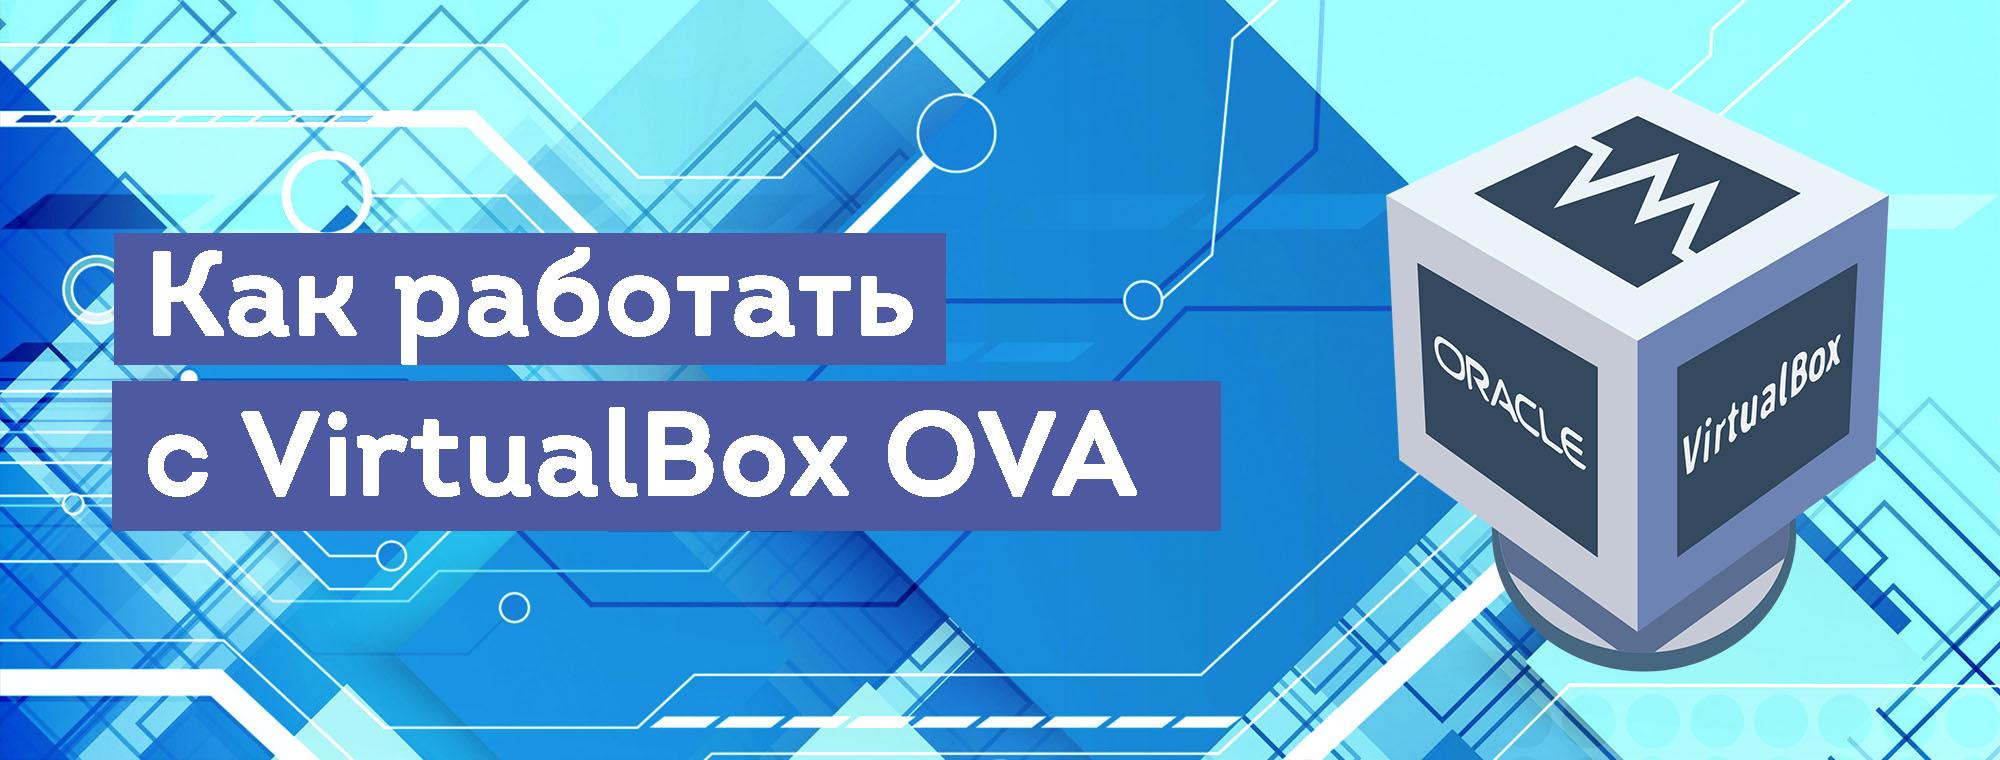 kak-rabotat-s-virtualbox-ova